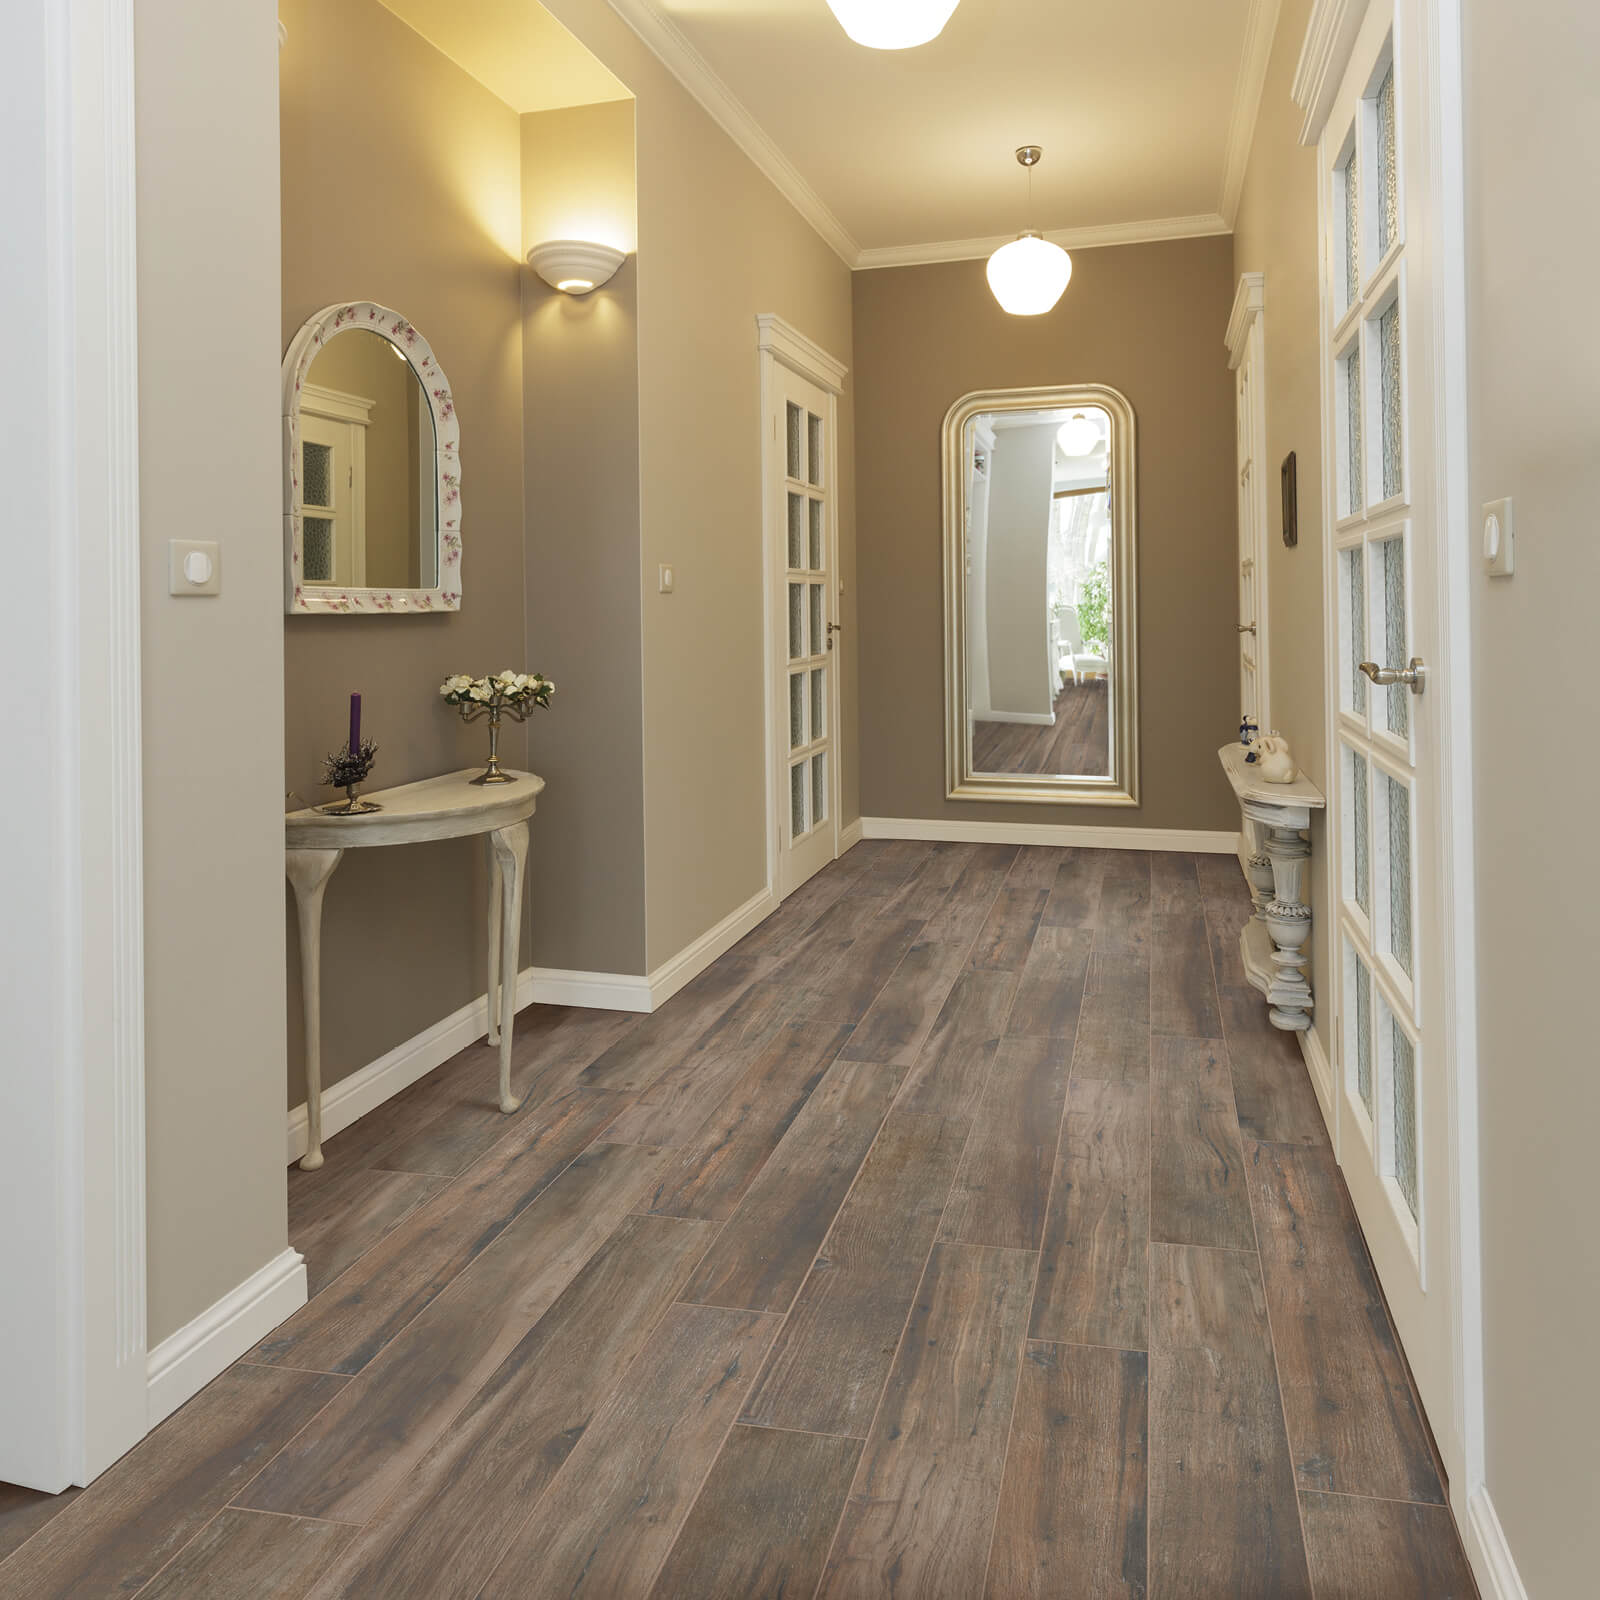 Magnolia bend chesapeake grey flooring | Great Floors